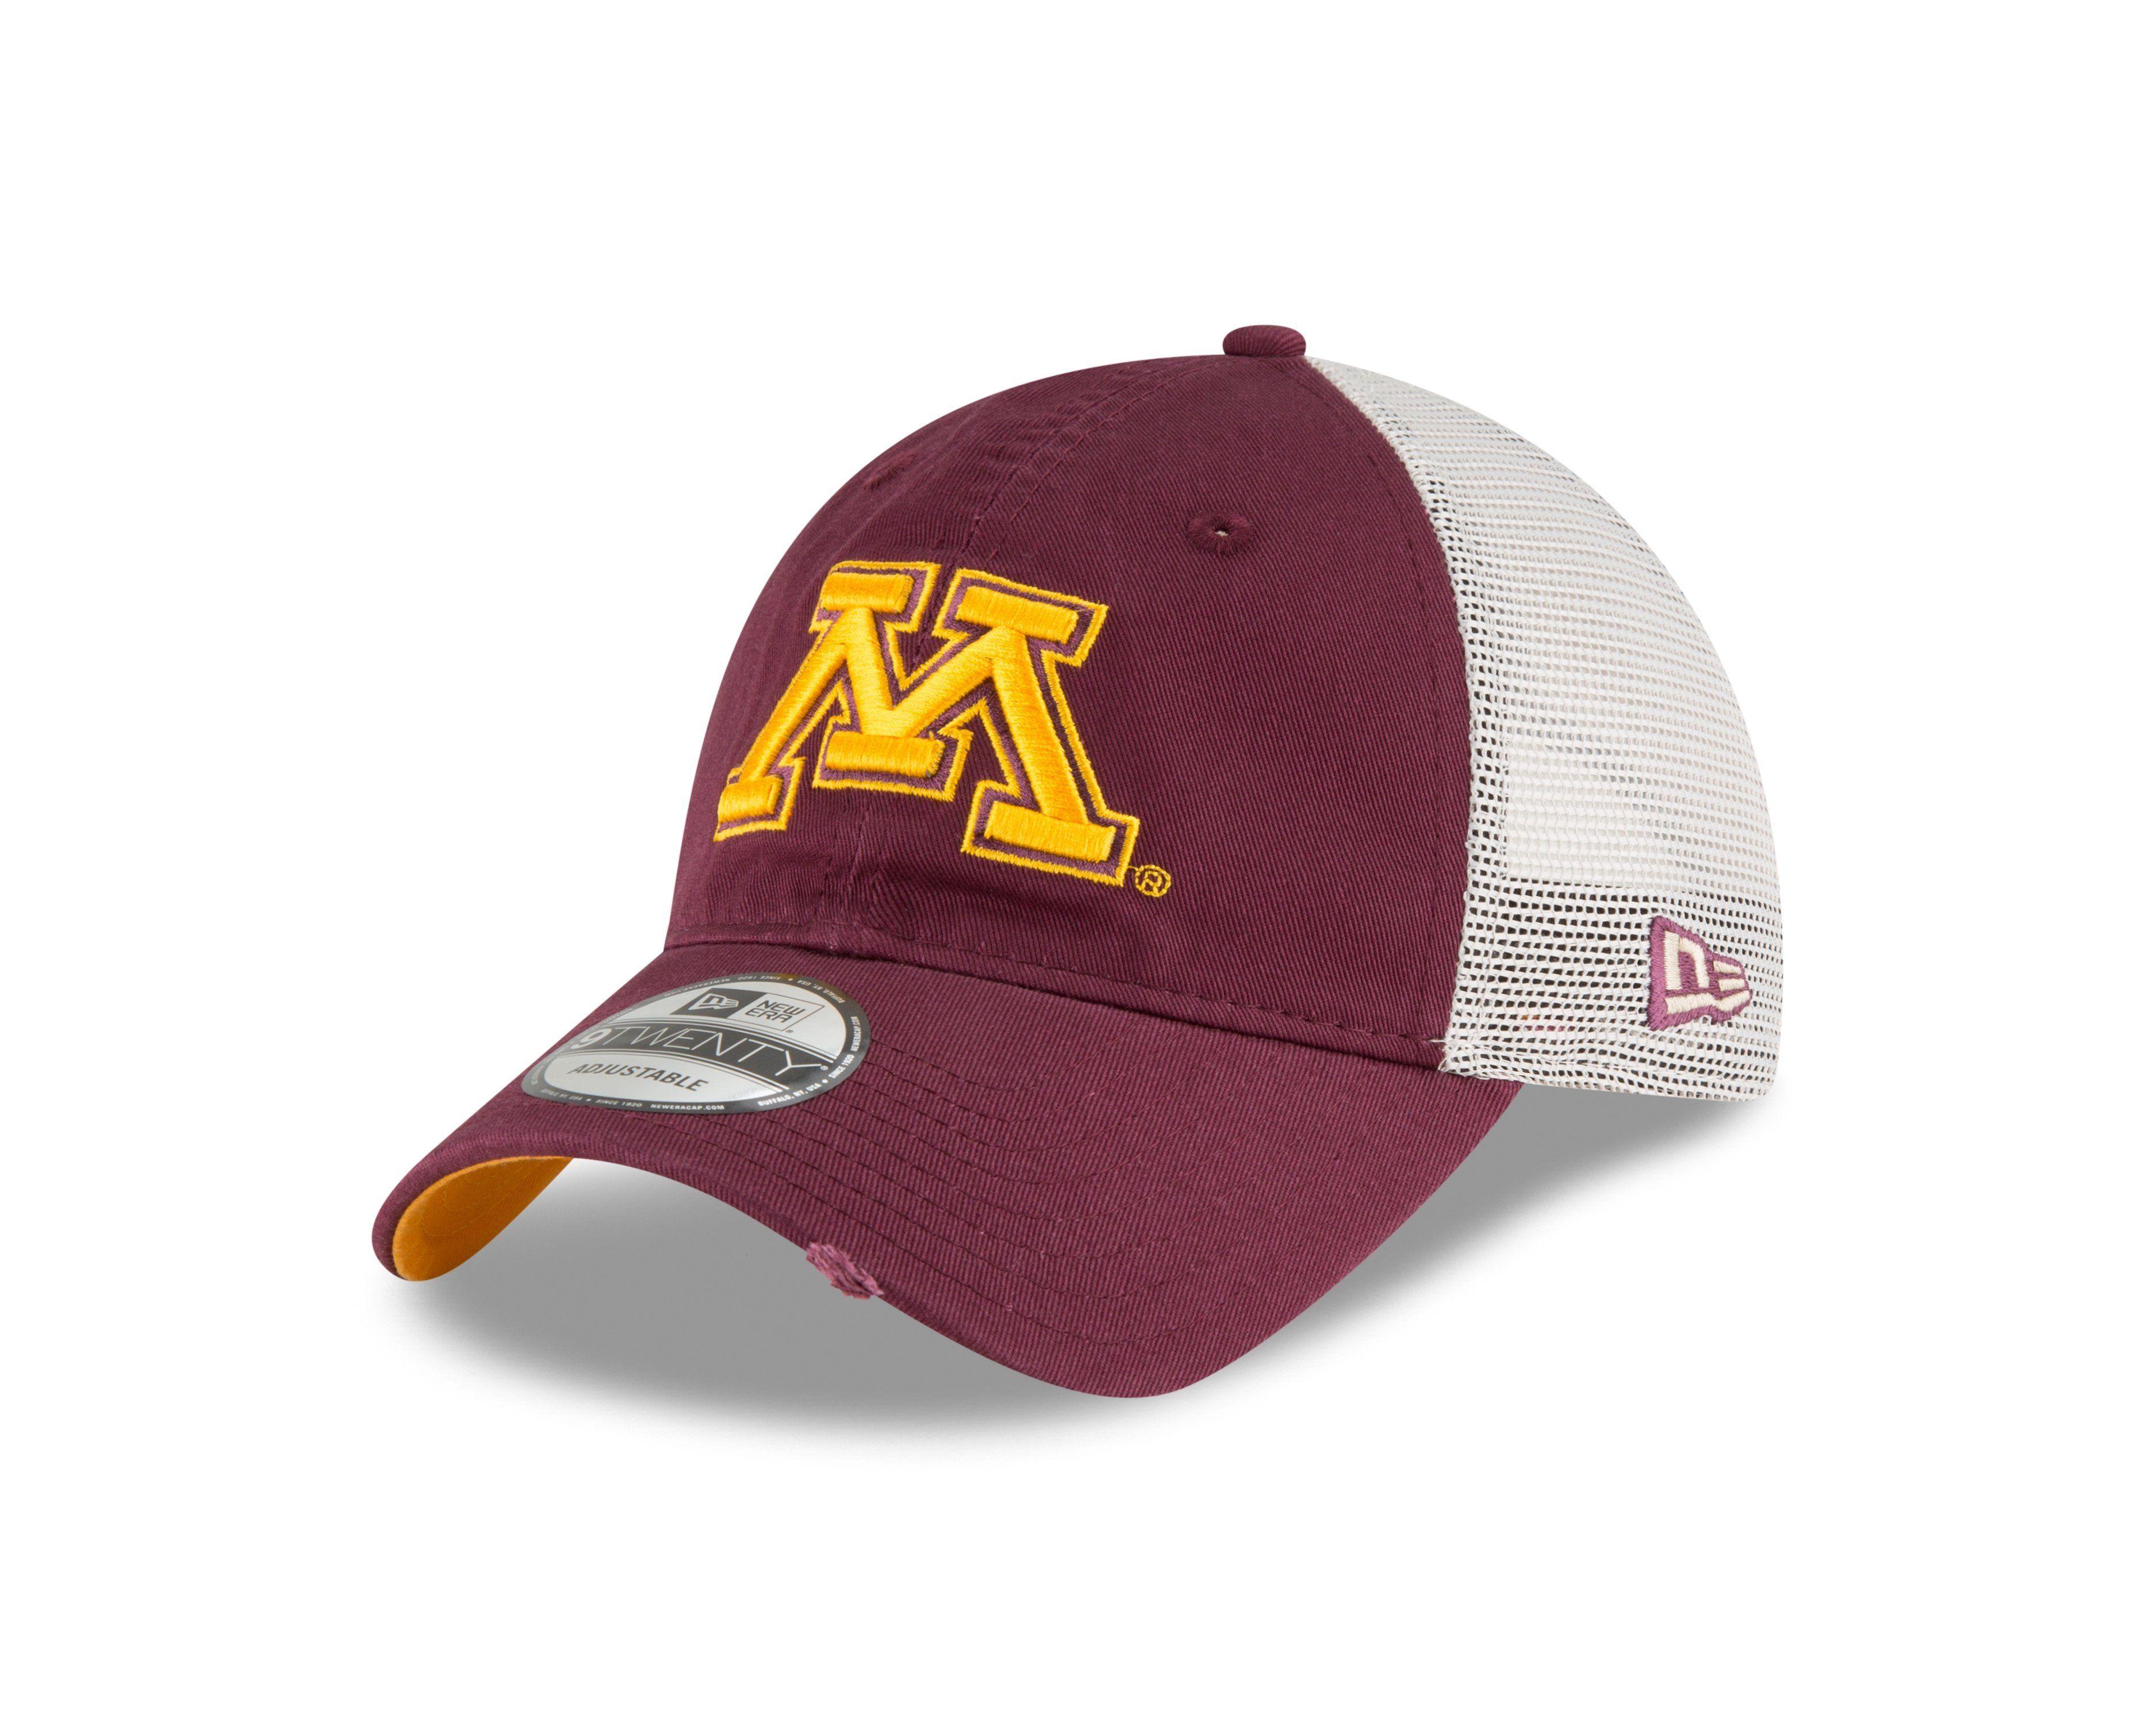 cheap for discount d0d6f 2cea3 ... snapback hat adjustable gold maroon 30507 68349 clearance minnesota  golden gophers new era state back 9twenty trucker adjustable hat 709a6  02664 ...